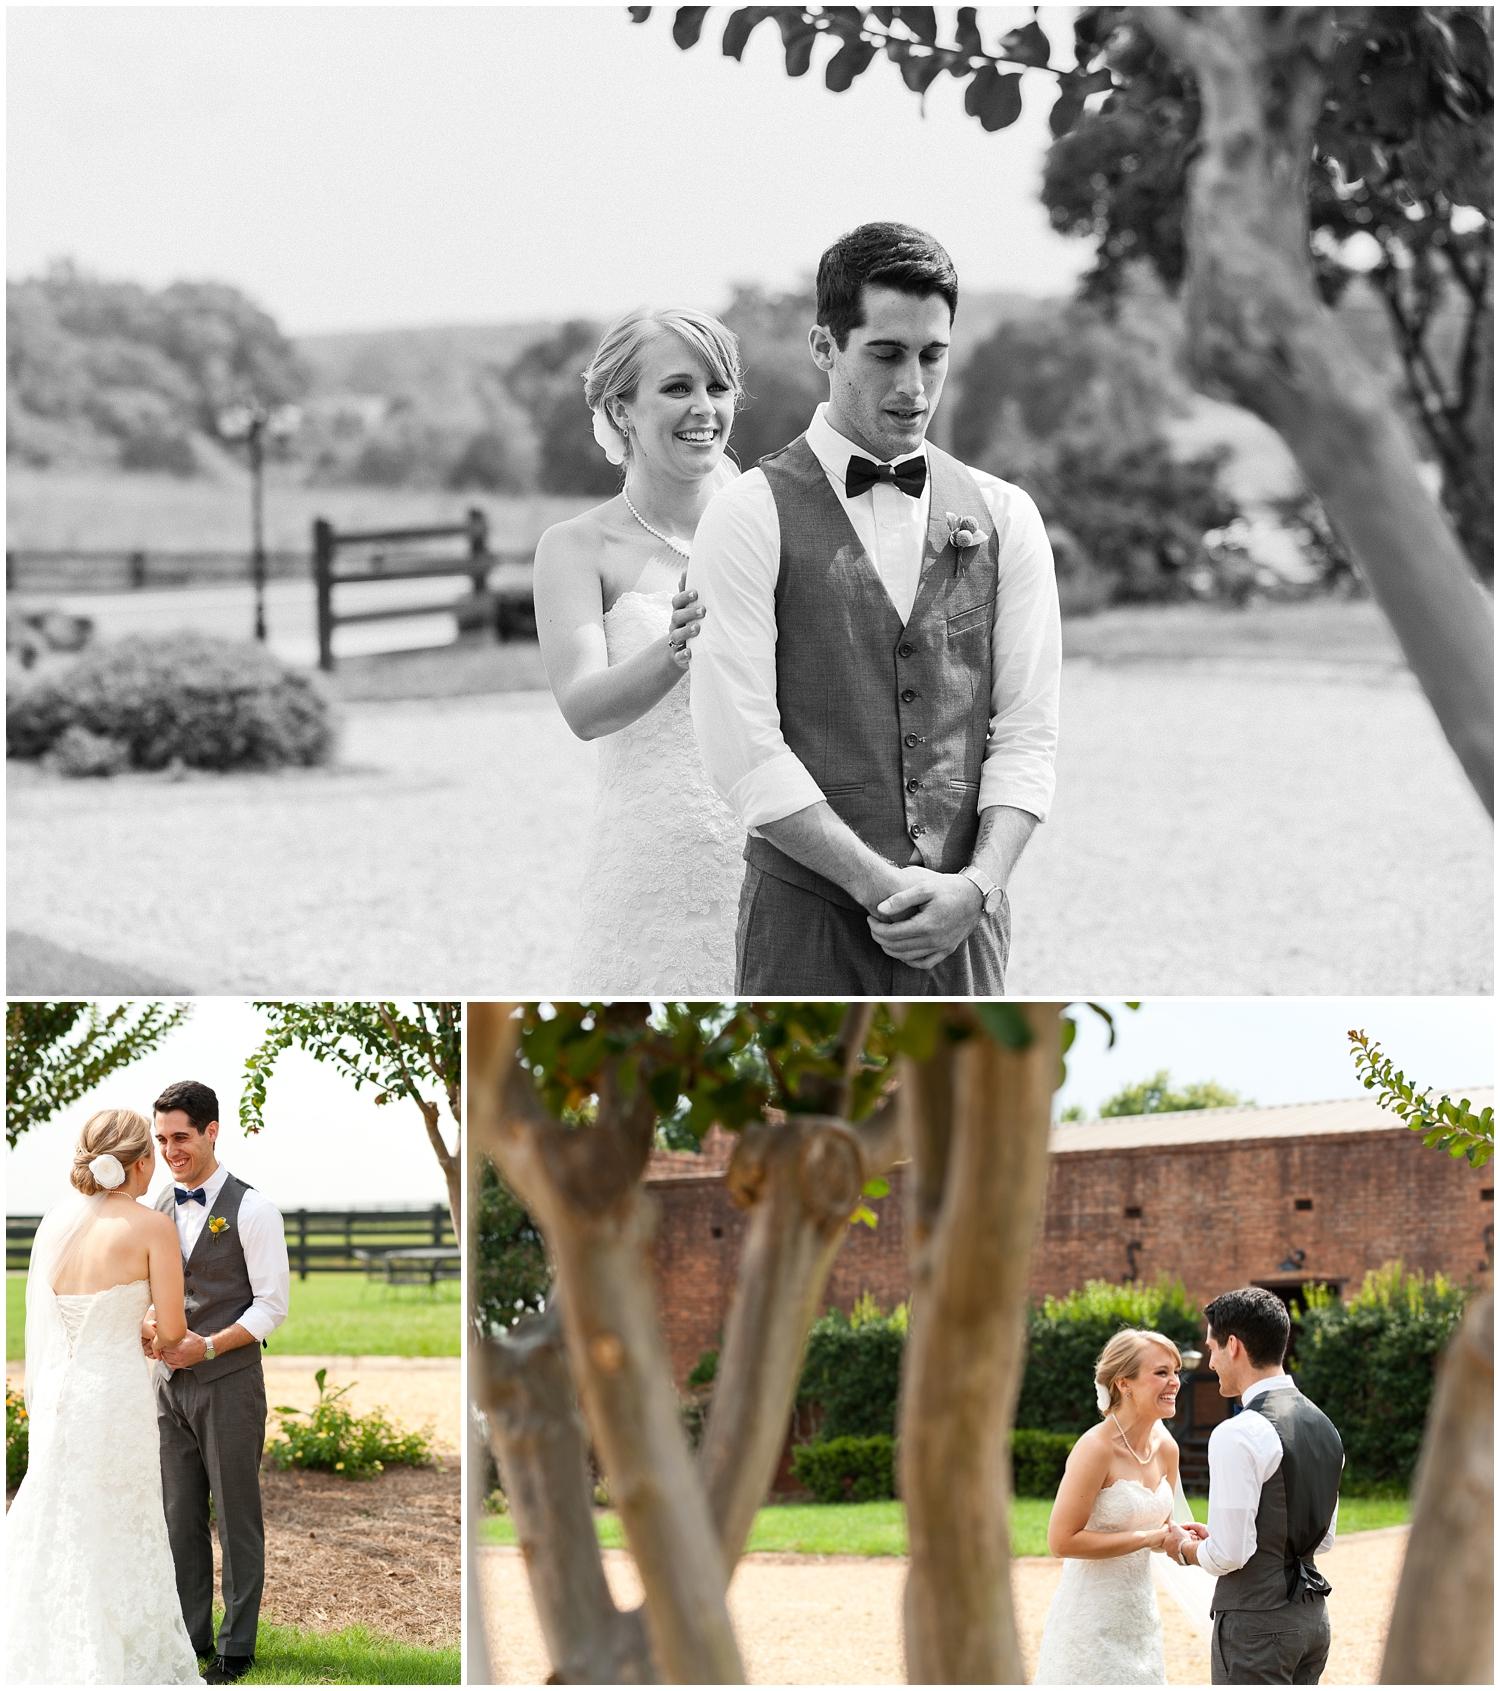 BloomandLo_PeteandAshley_Smithonia_Farm_Wedding_Blog_0012.jpg